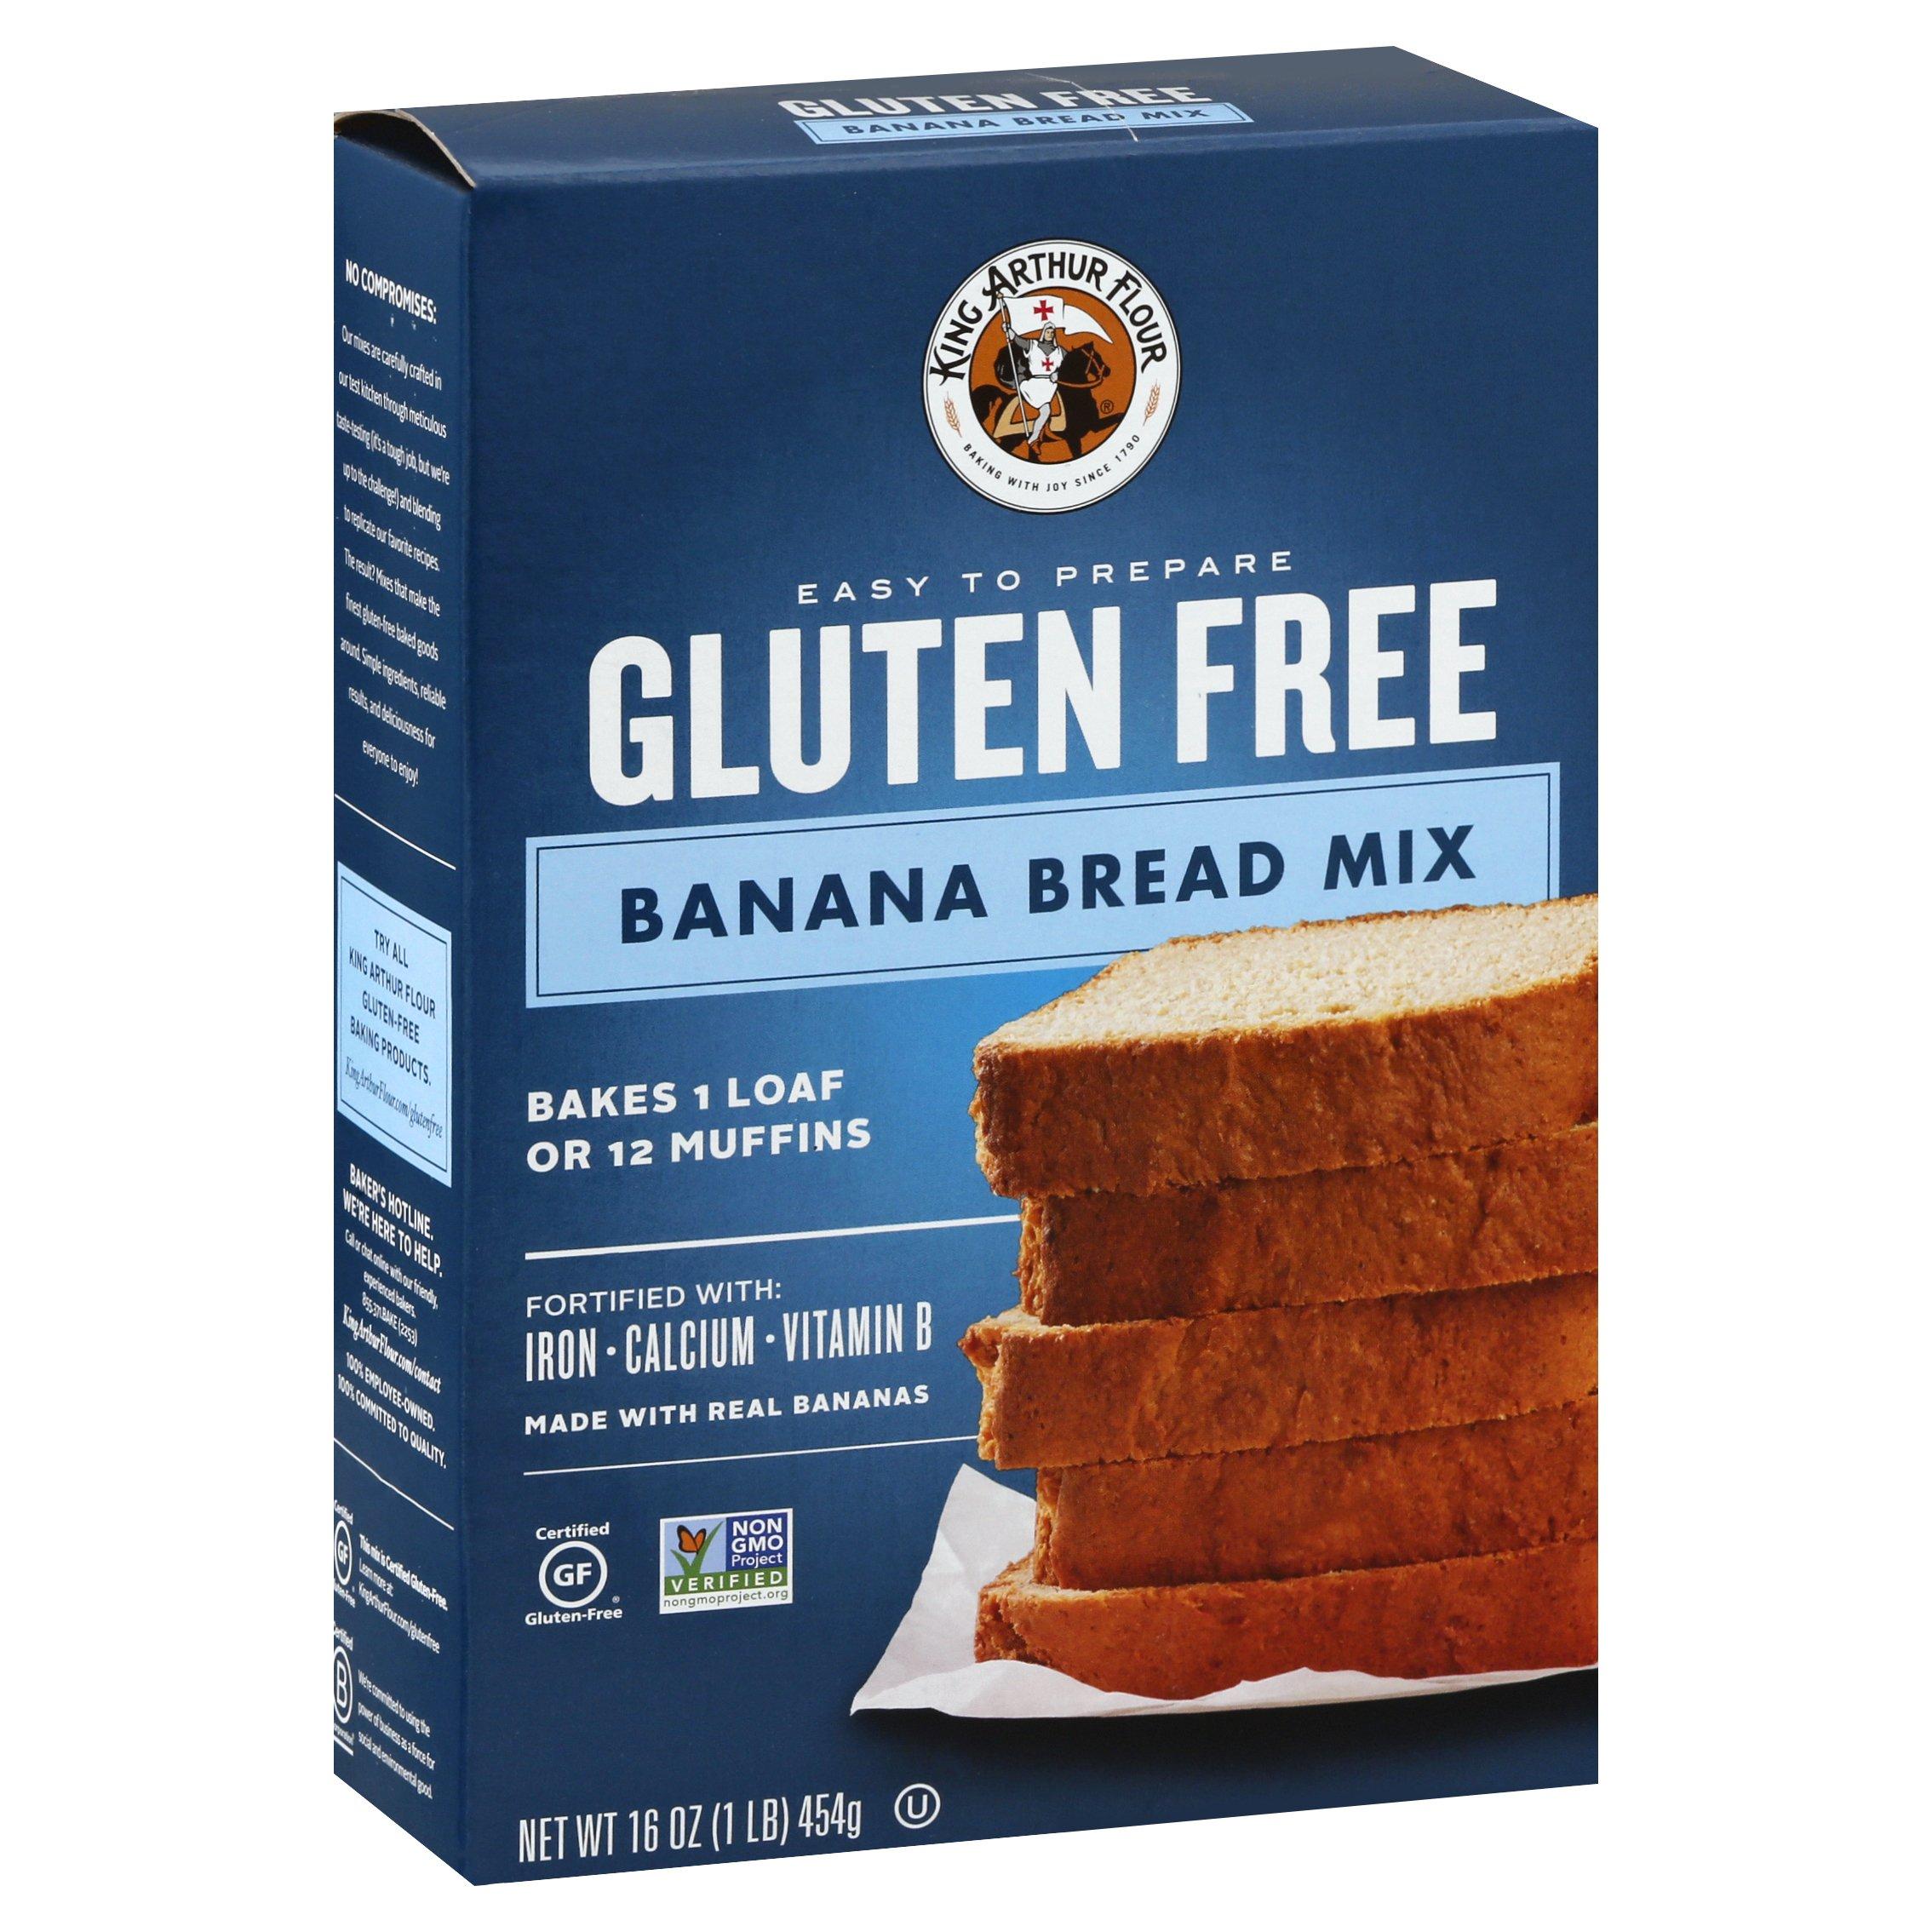 King Arthur Gluten Free Banana Bread 16OZ 6-Pack